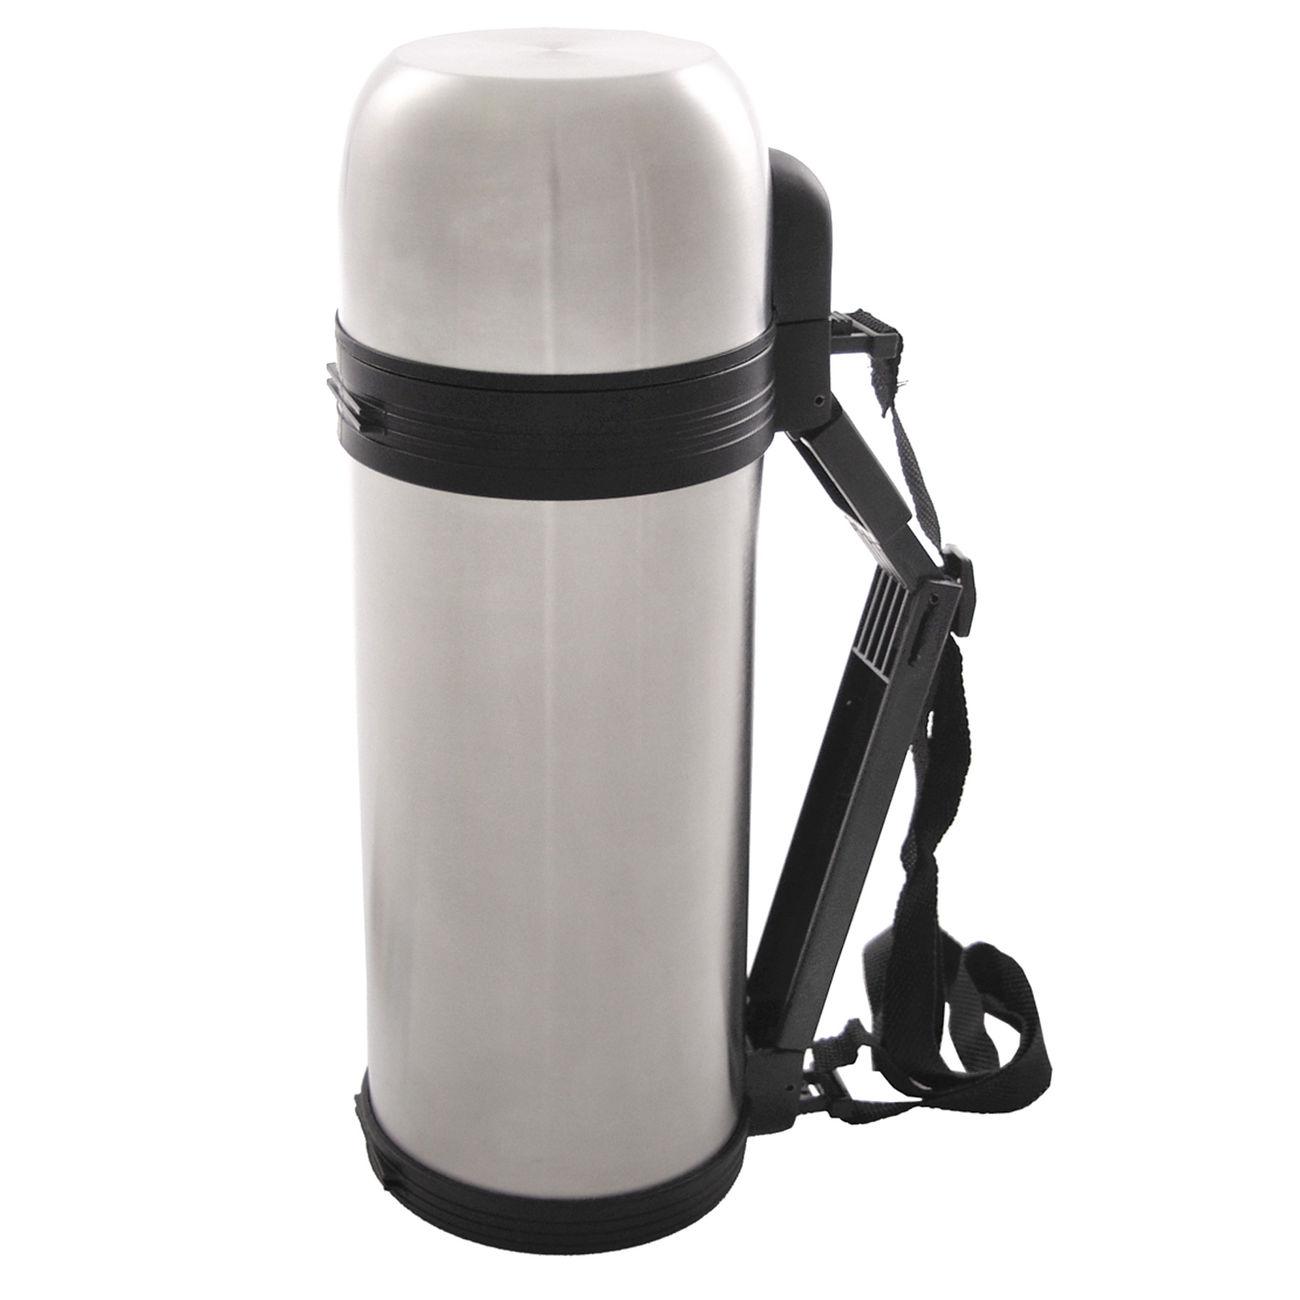 fox outdoor vakuum thermoskanne edelstahl 1 5 liter kotte zeller. Black Bedroom Furniture Sets. Home Design Ideas